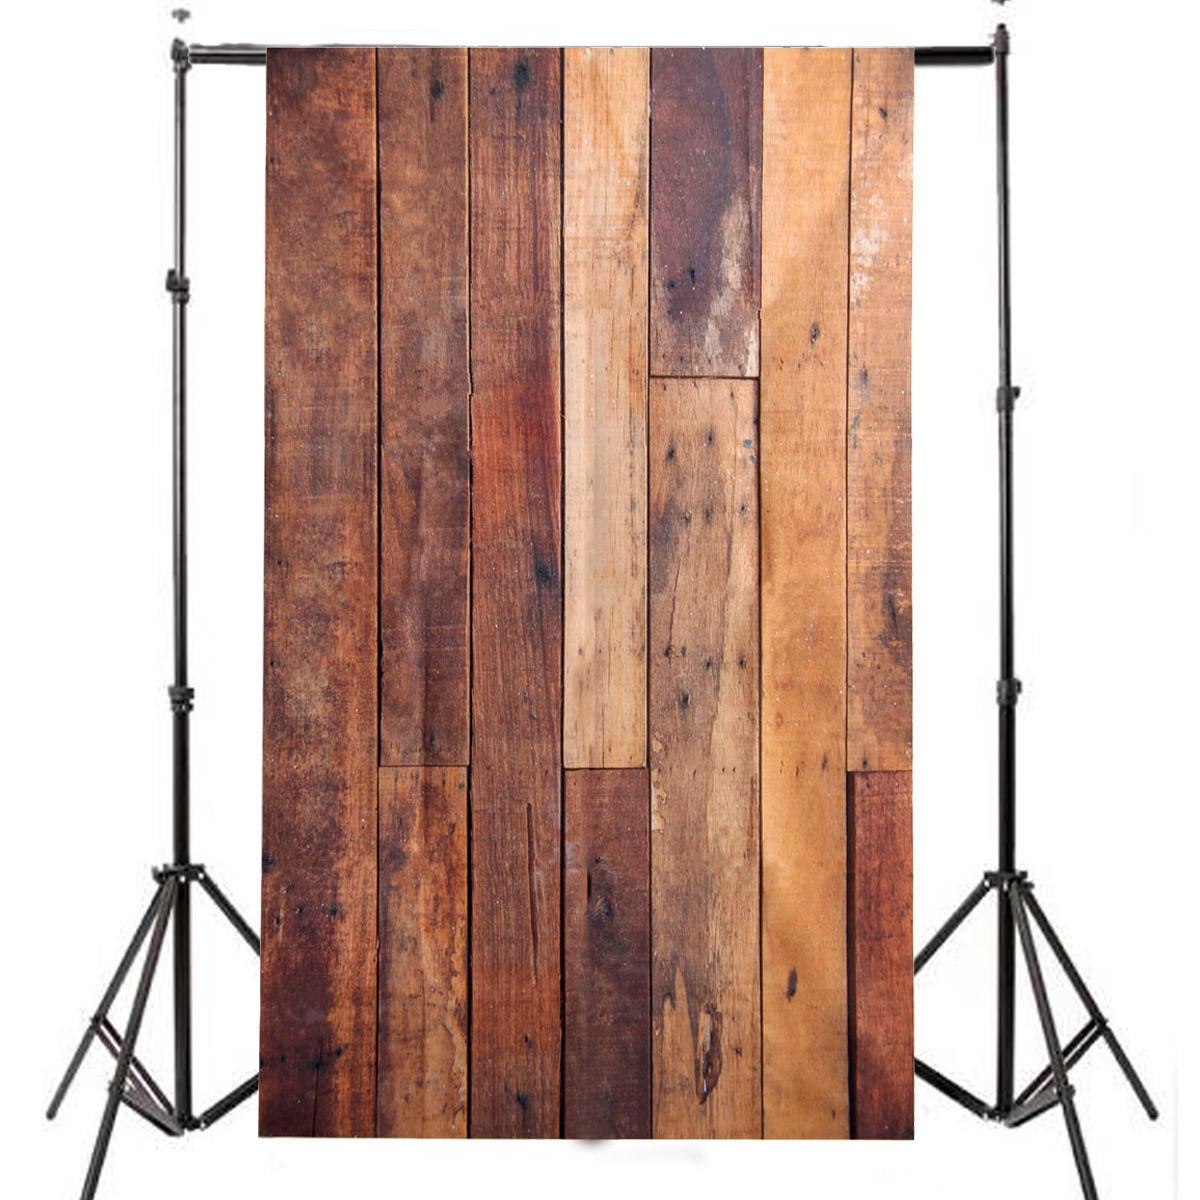 3x5ft flower wood wall vinyl background photography photo studio props - 3x5ft Wooden Wall Studio Prop Vinyl Photo Background Photography